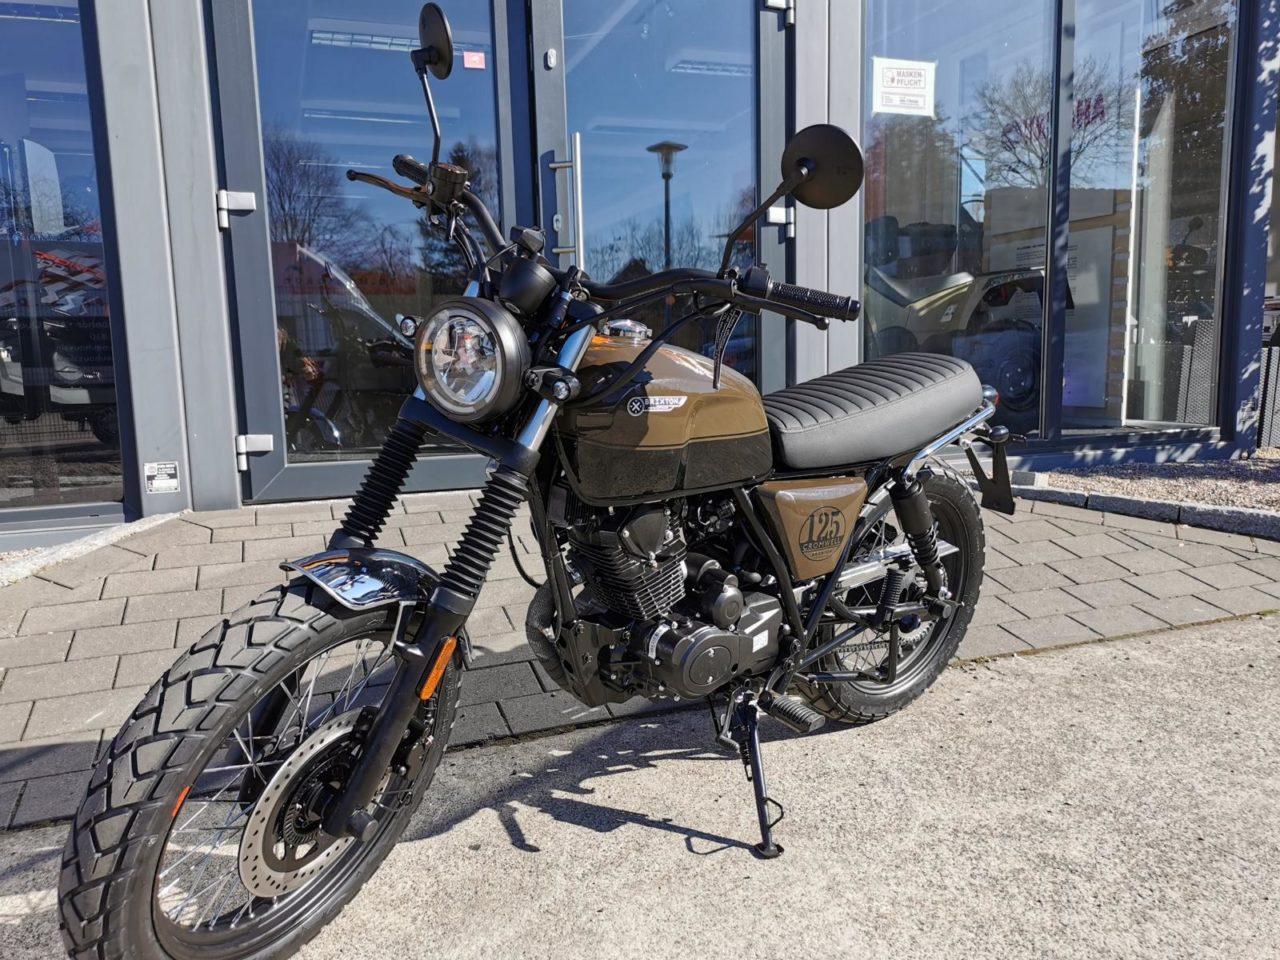 Motorrad Brixton Cromwell 125 Modell 2021, ABS, Euro 5